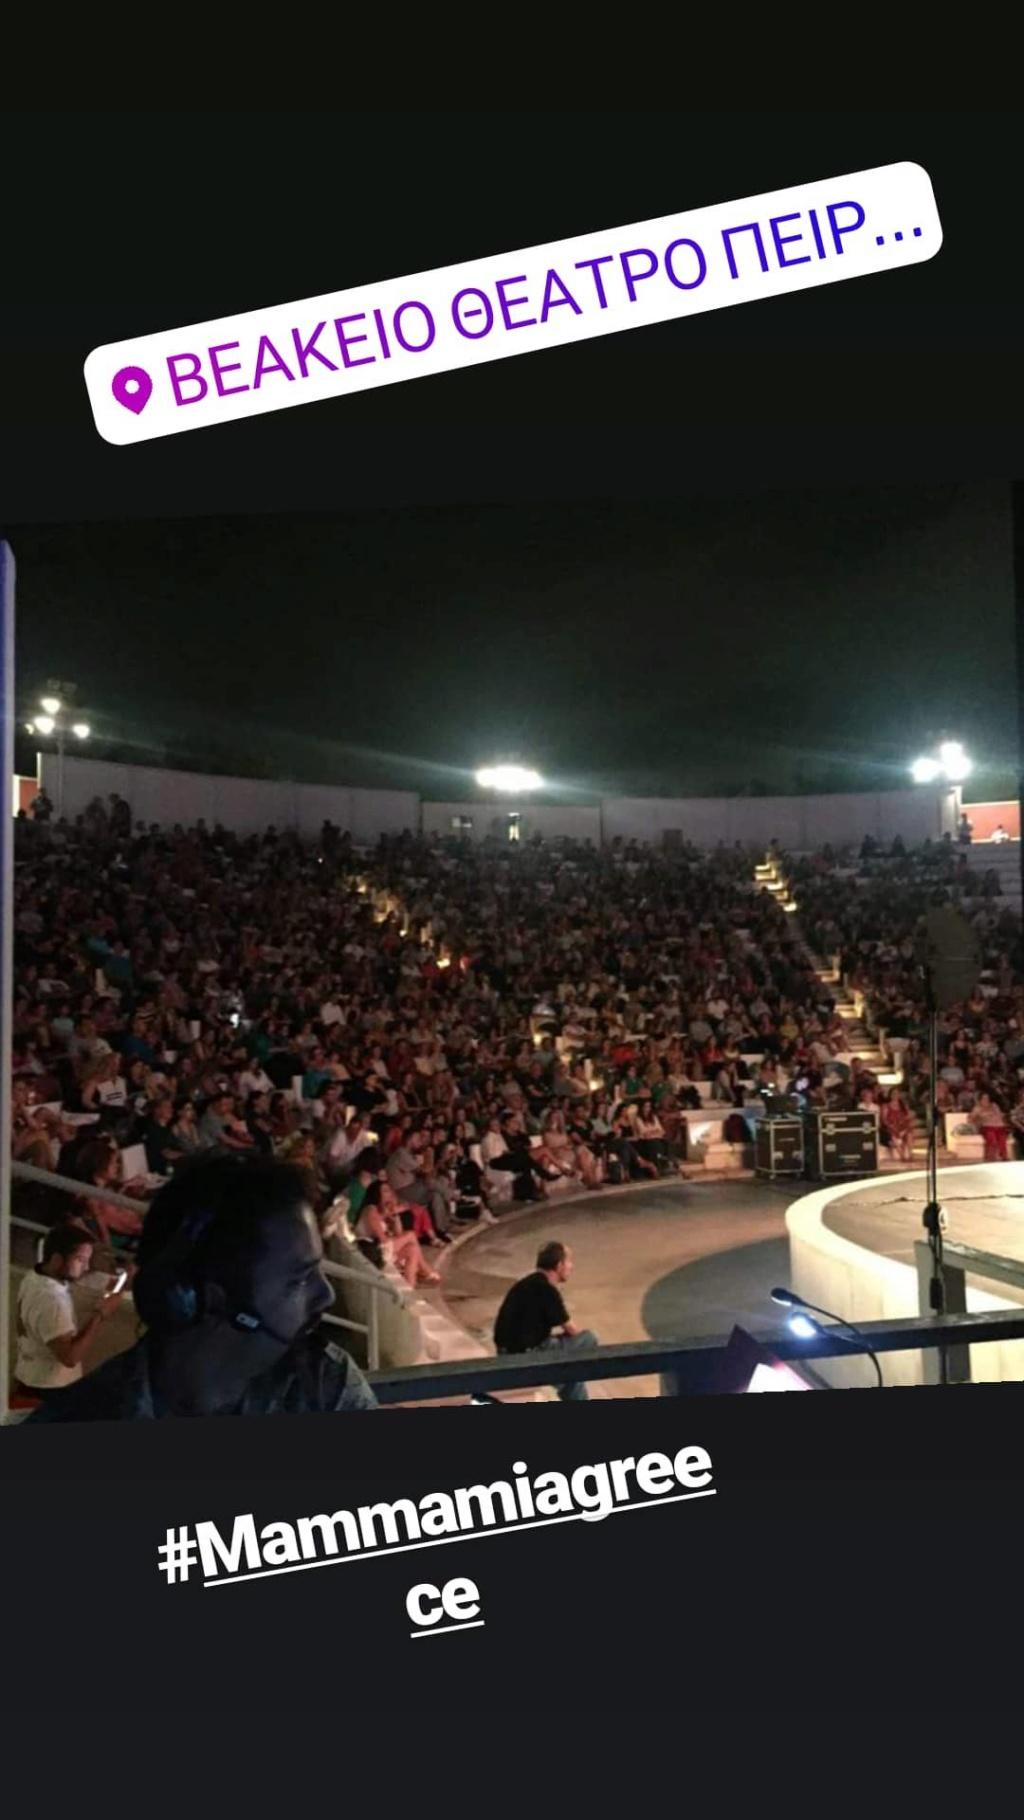 mammamiagreece - Mamma Mia - Καλοκαιρινή Περιοδεία 2018 - Σελίδα 25 36789010